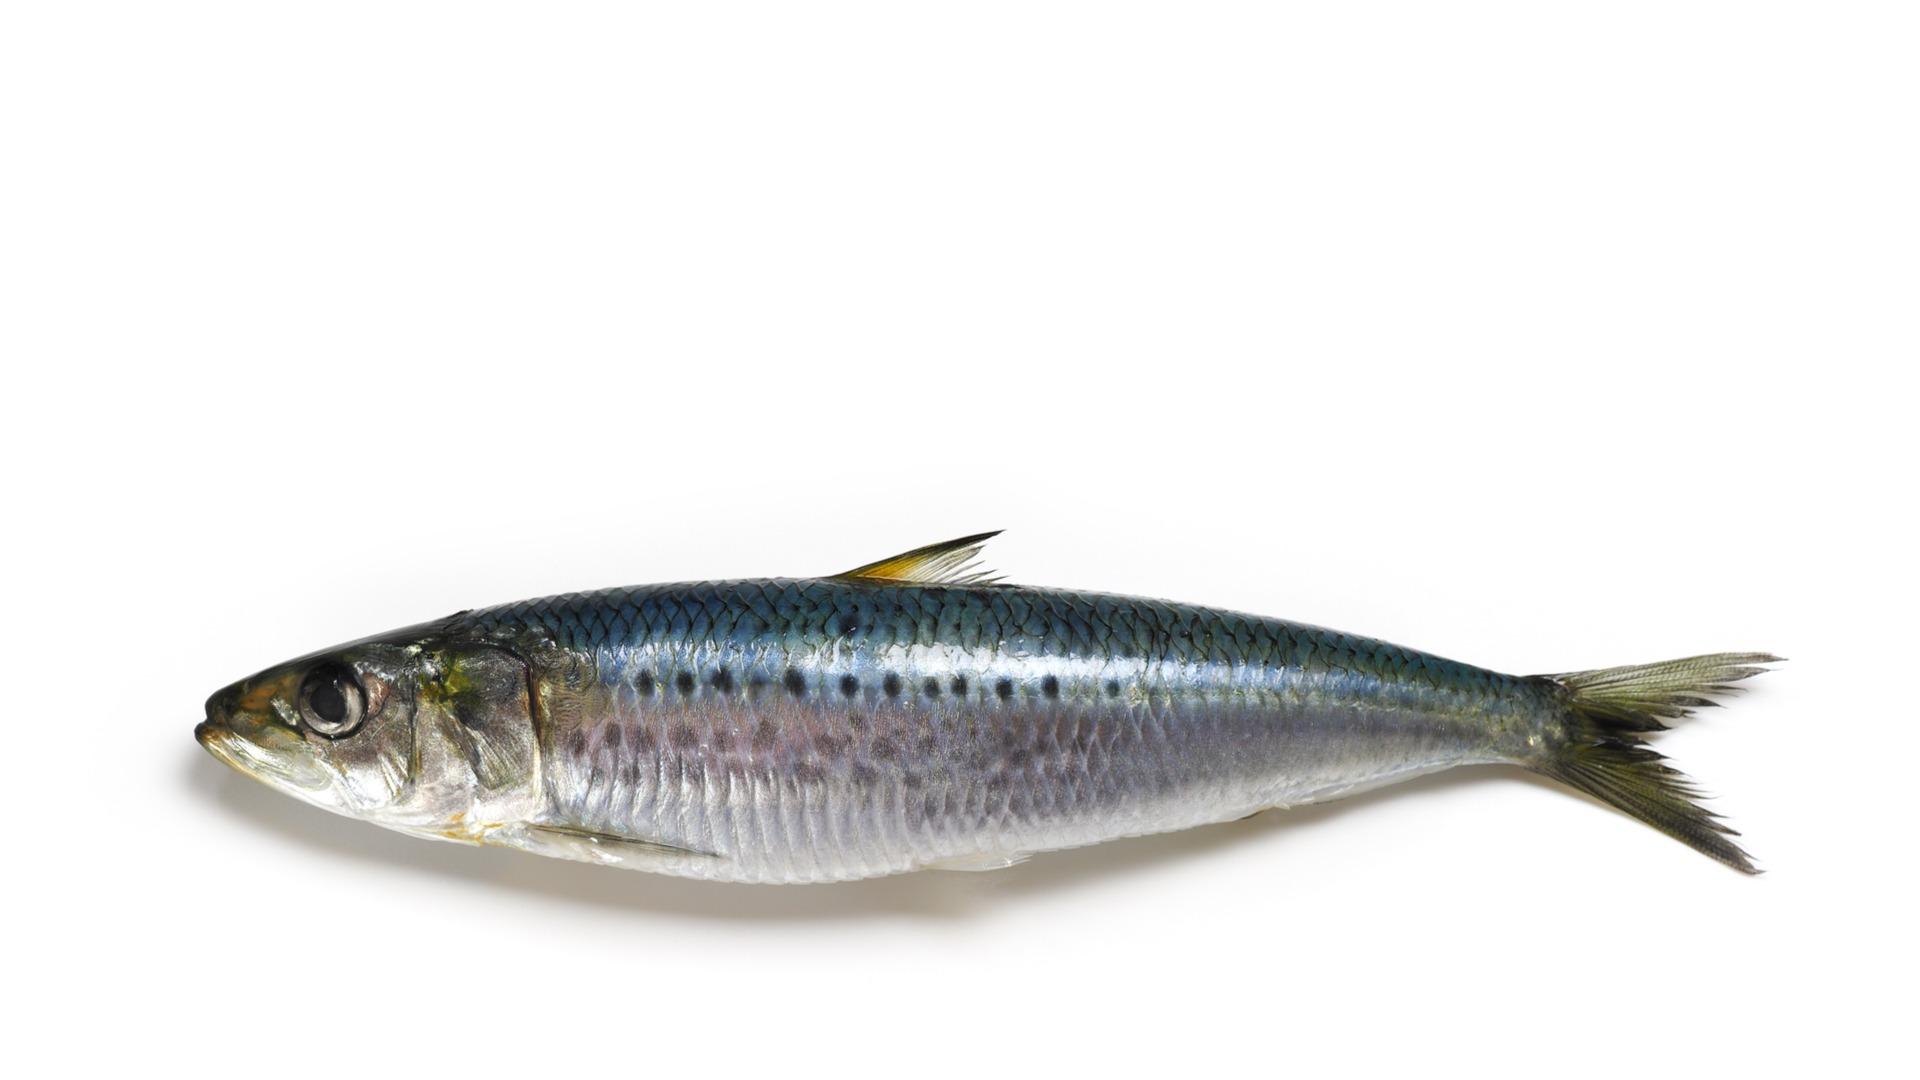 anchovy, sardine